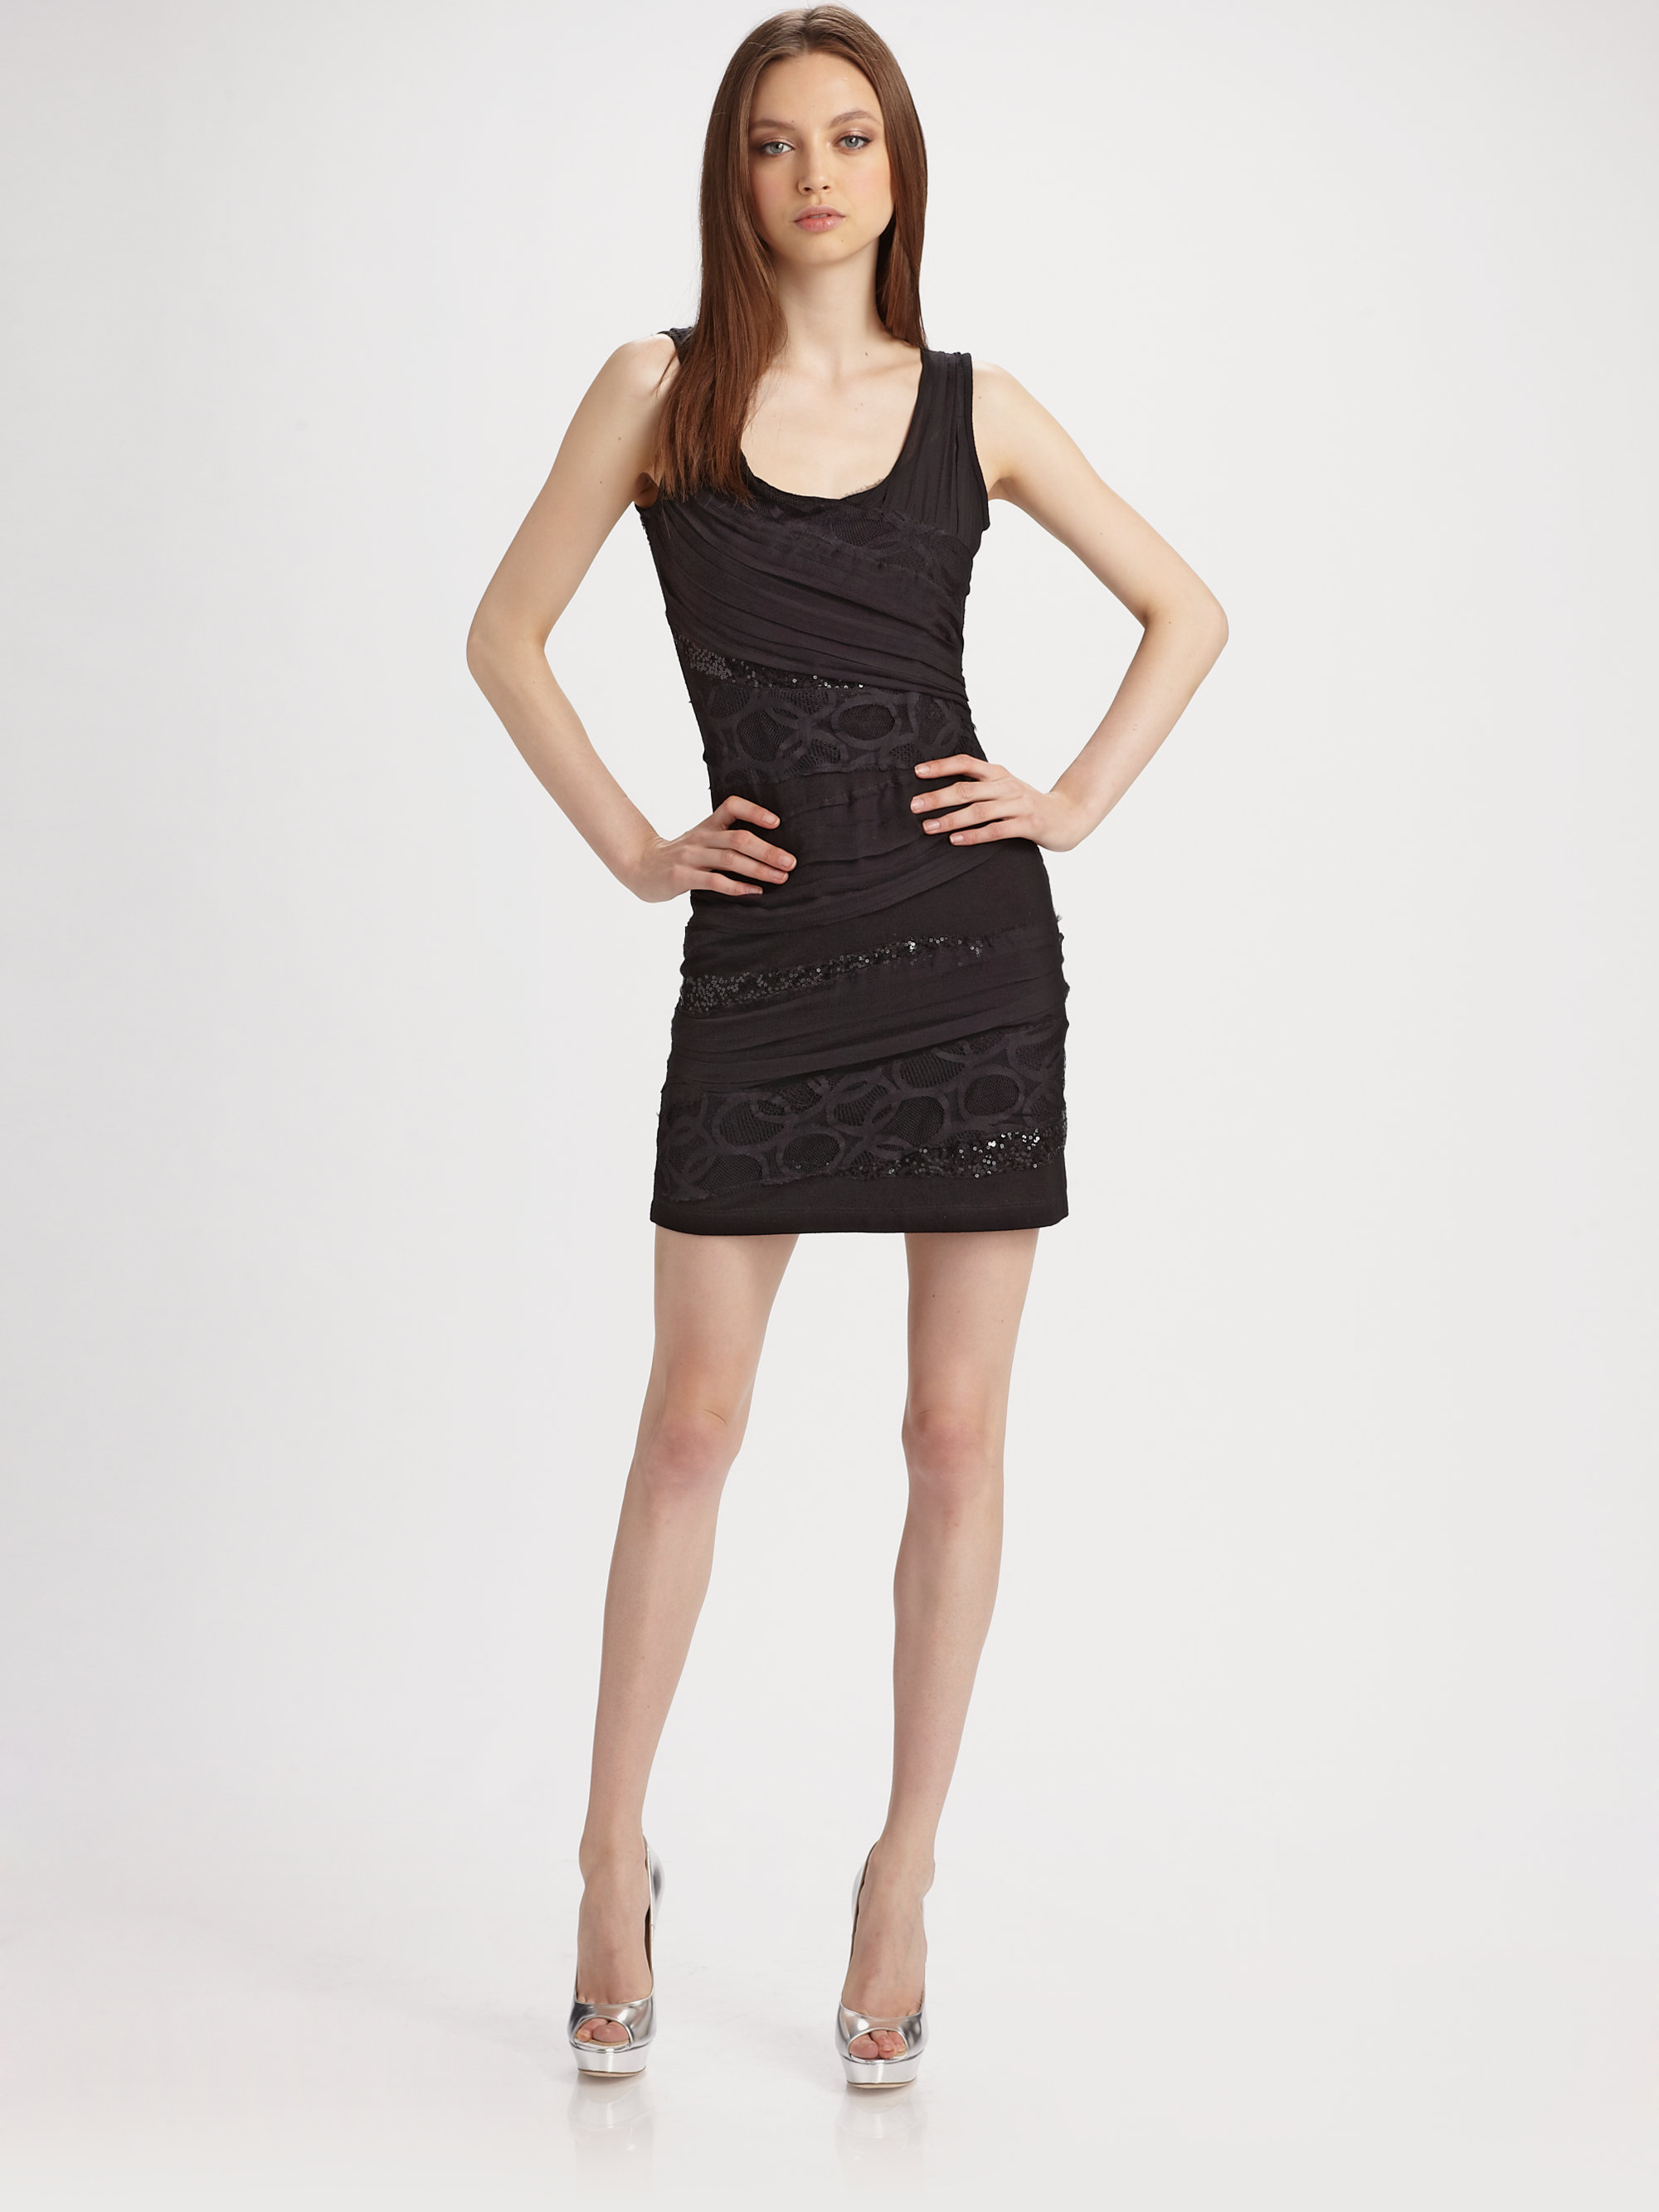 Lyst - Royal Underground Bondage Dress in Black